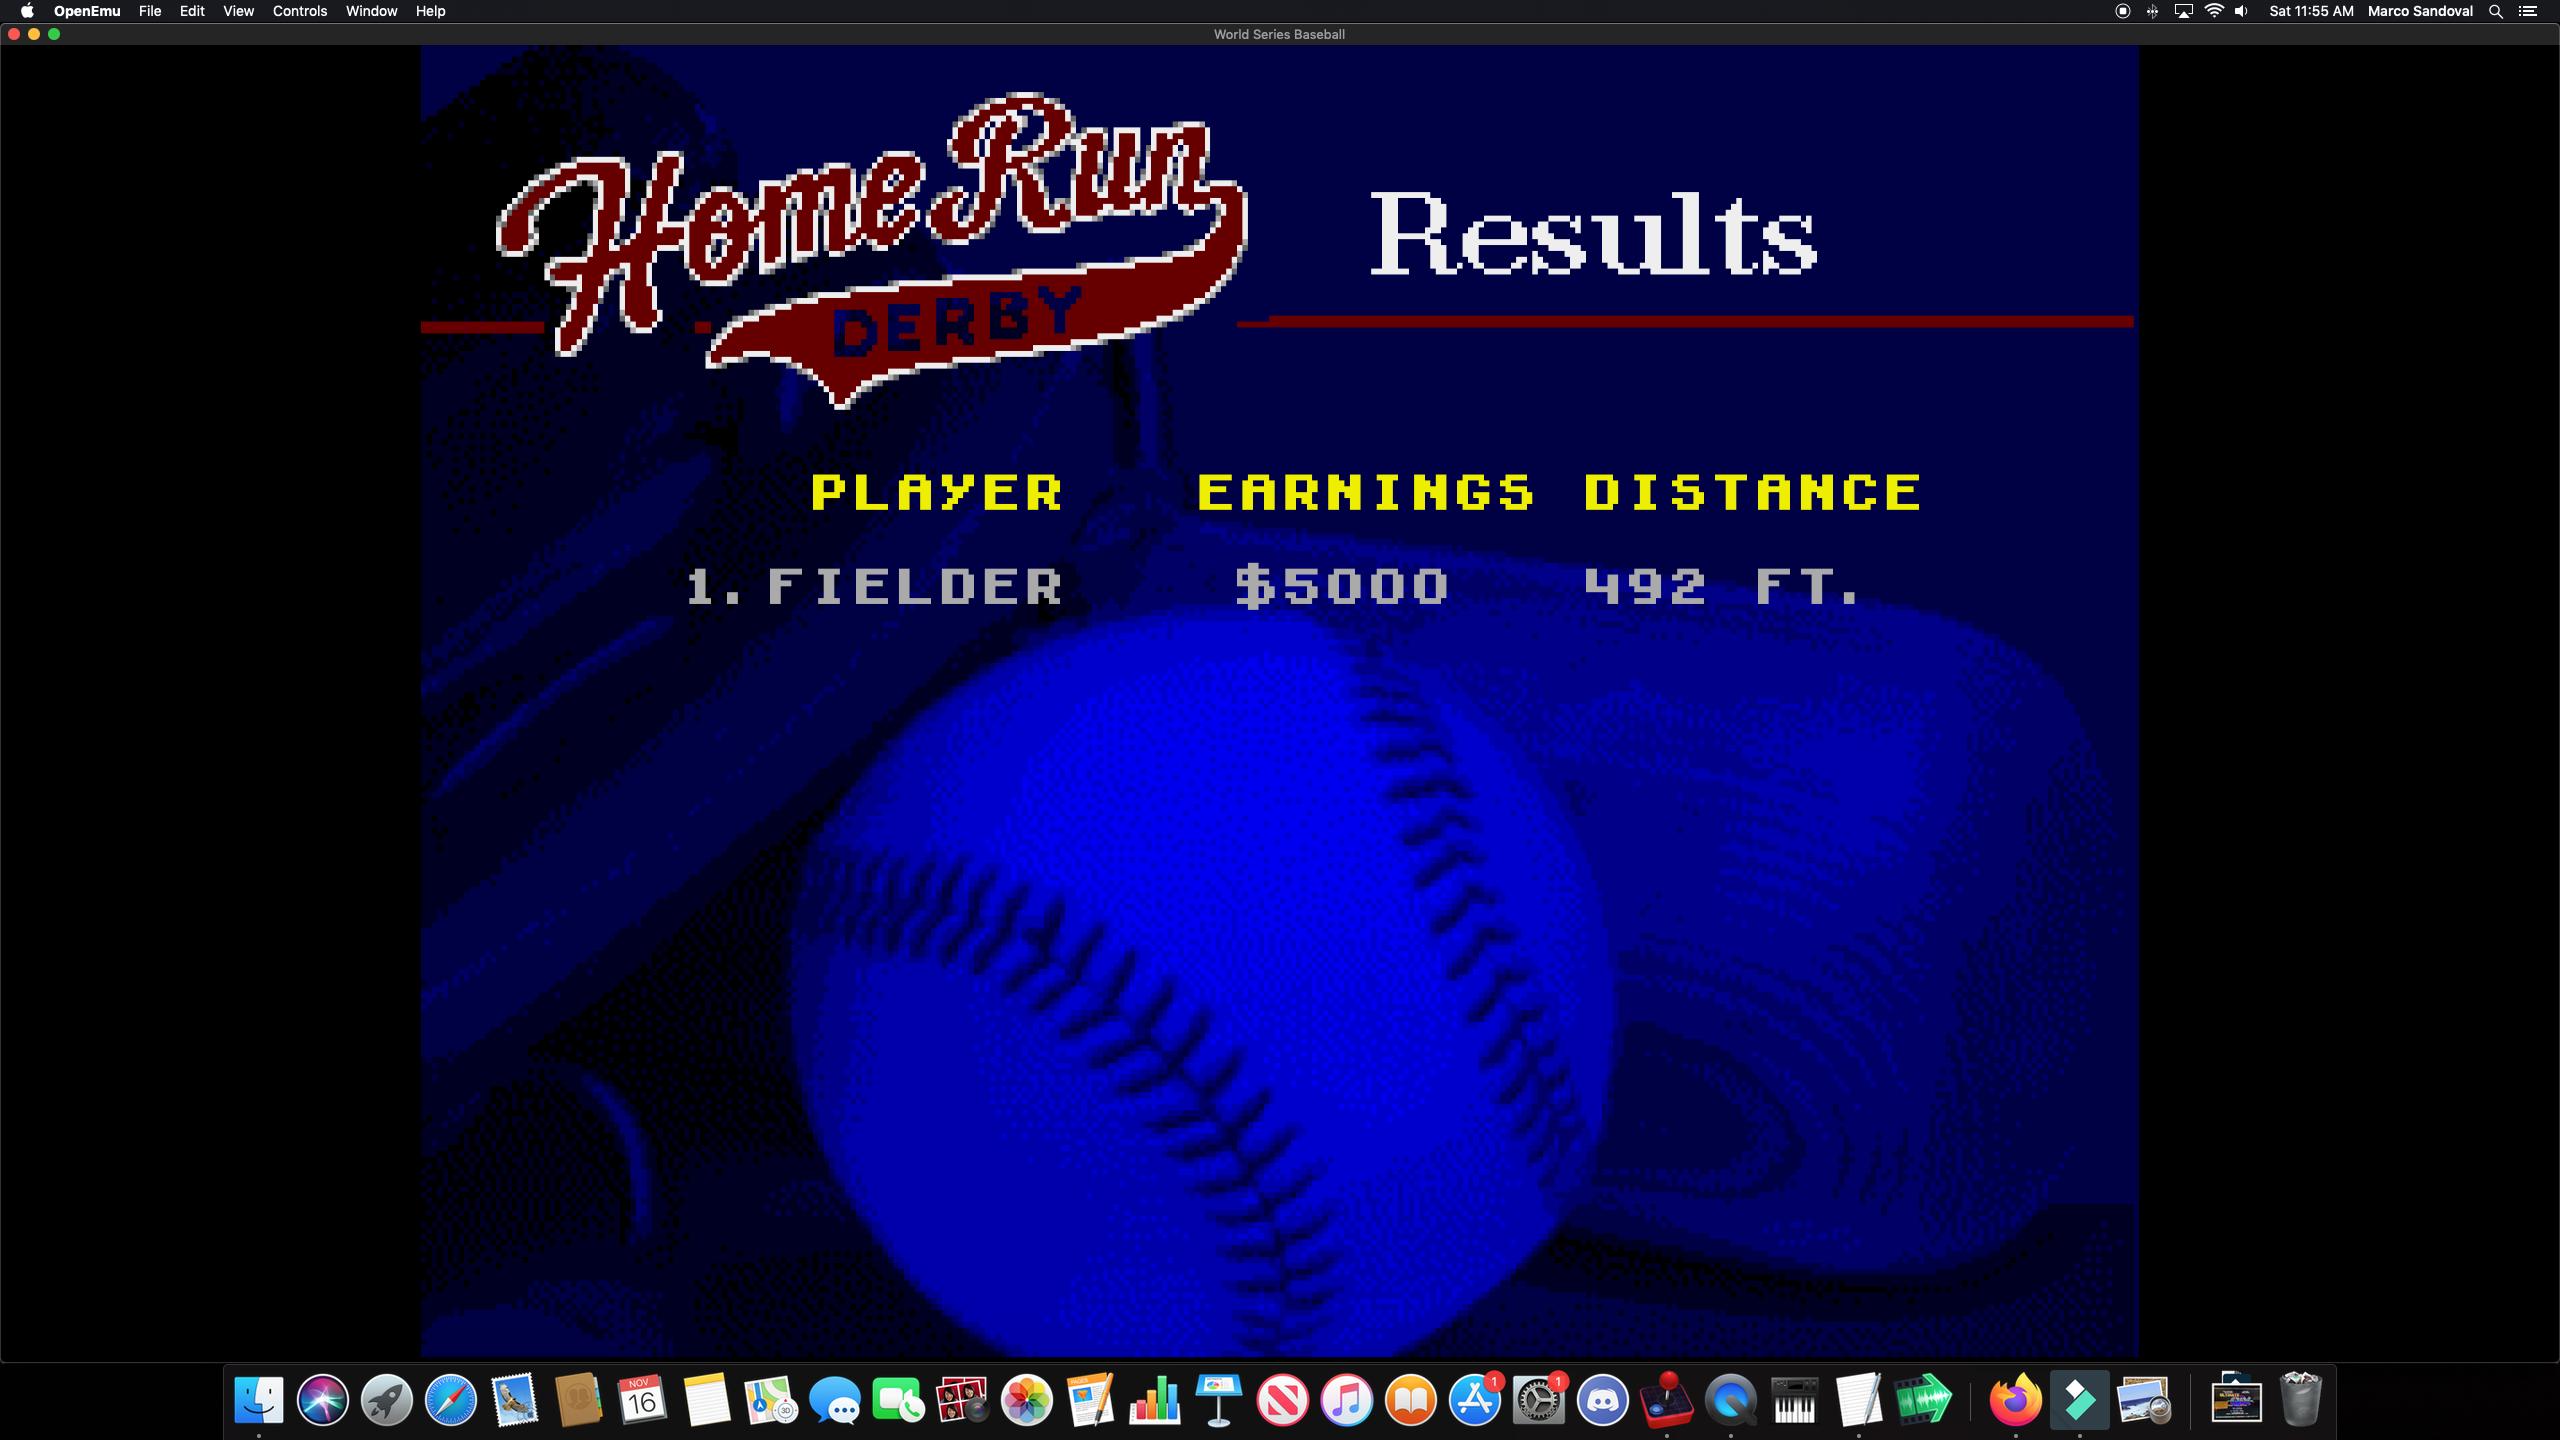 Marco1019: World Series Baseball: Home Run Derby [Longest Home Run in Feet] (Sega Genesis / MegaDrive Emulated) 492 points on 2019-11-16 15:03:41